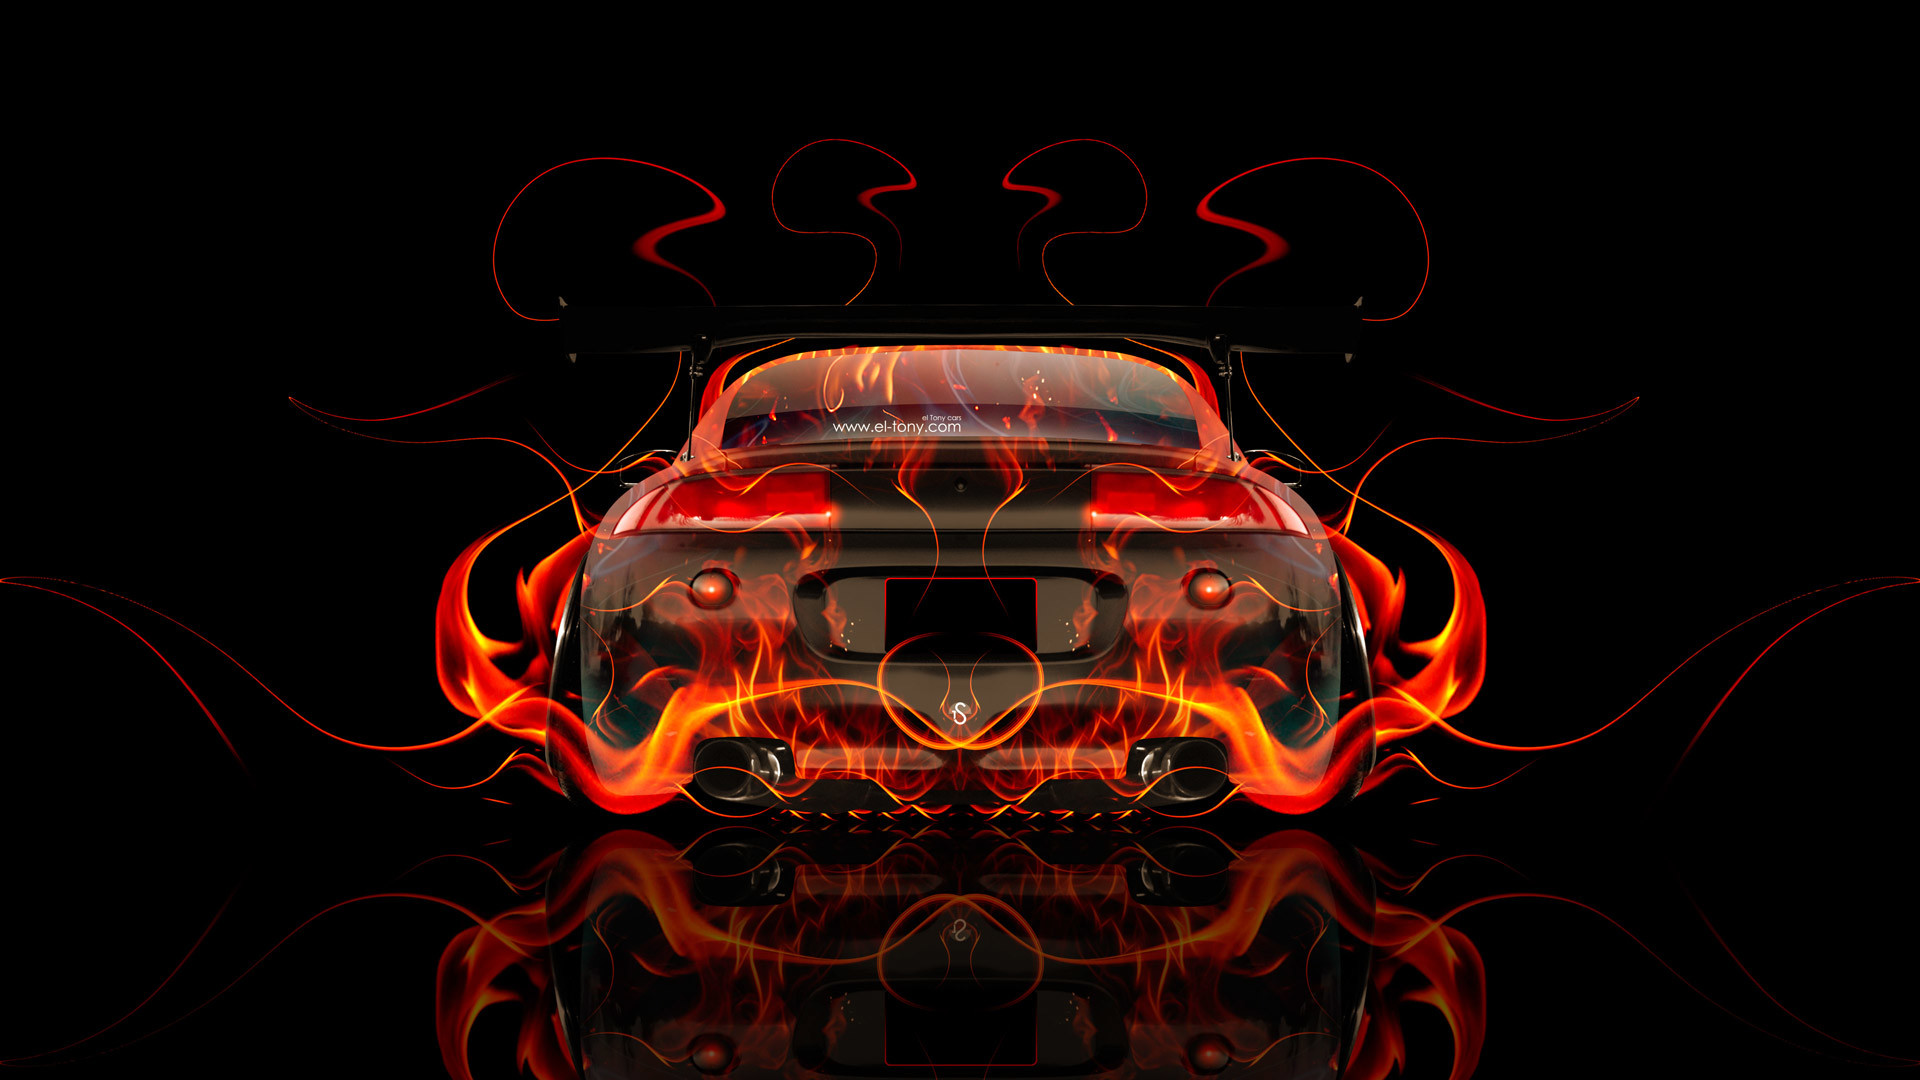 1920x1080 2015 Mitsubishi Lancer Evolution HD Wallpaper    Http://wallsauto.com/2015